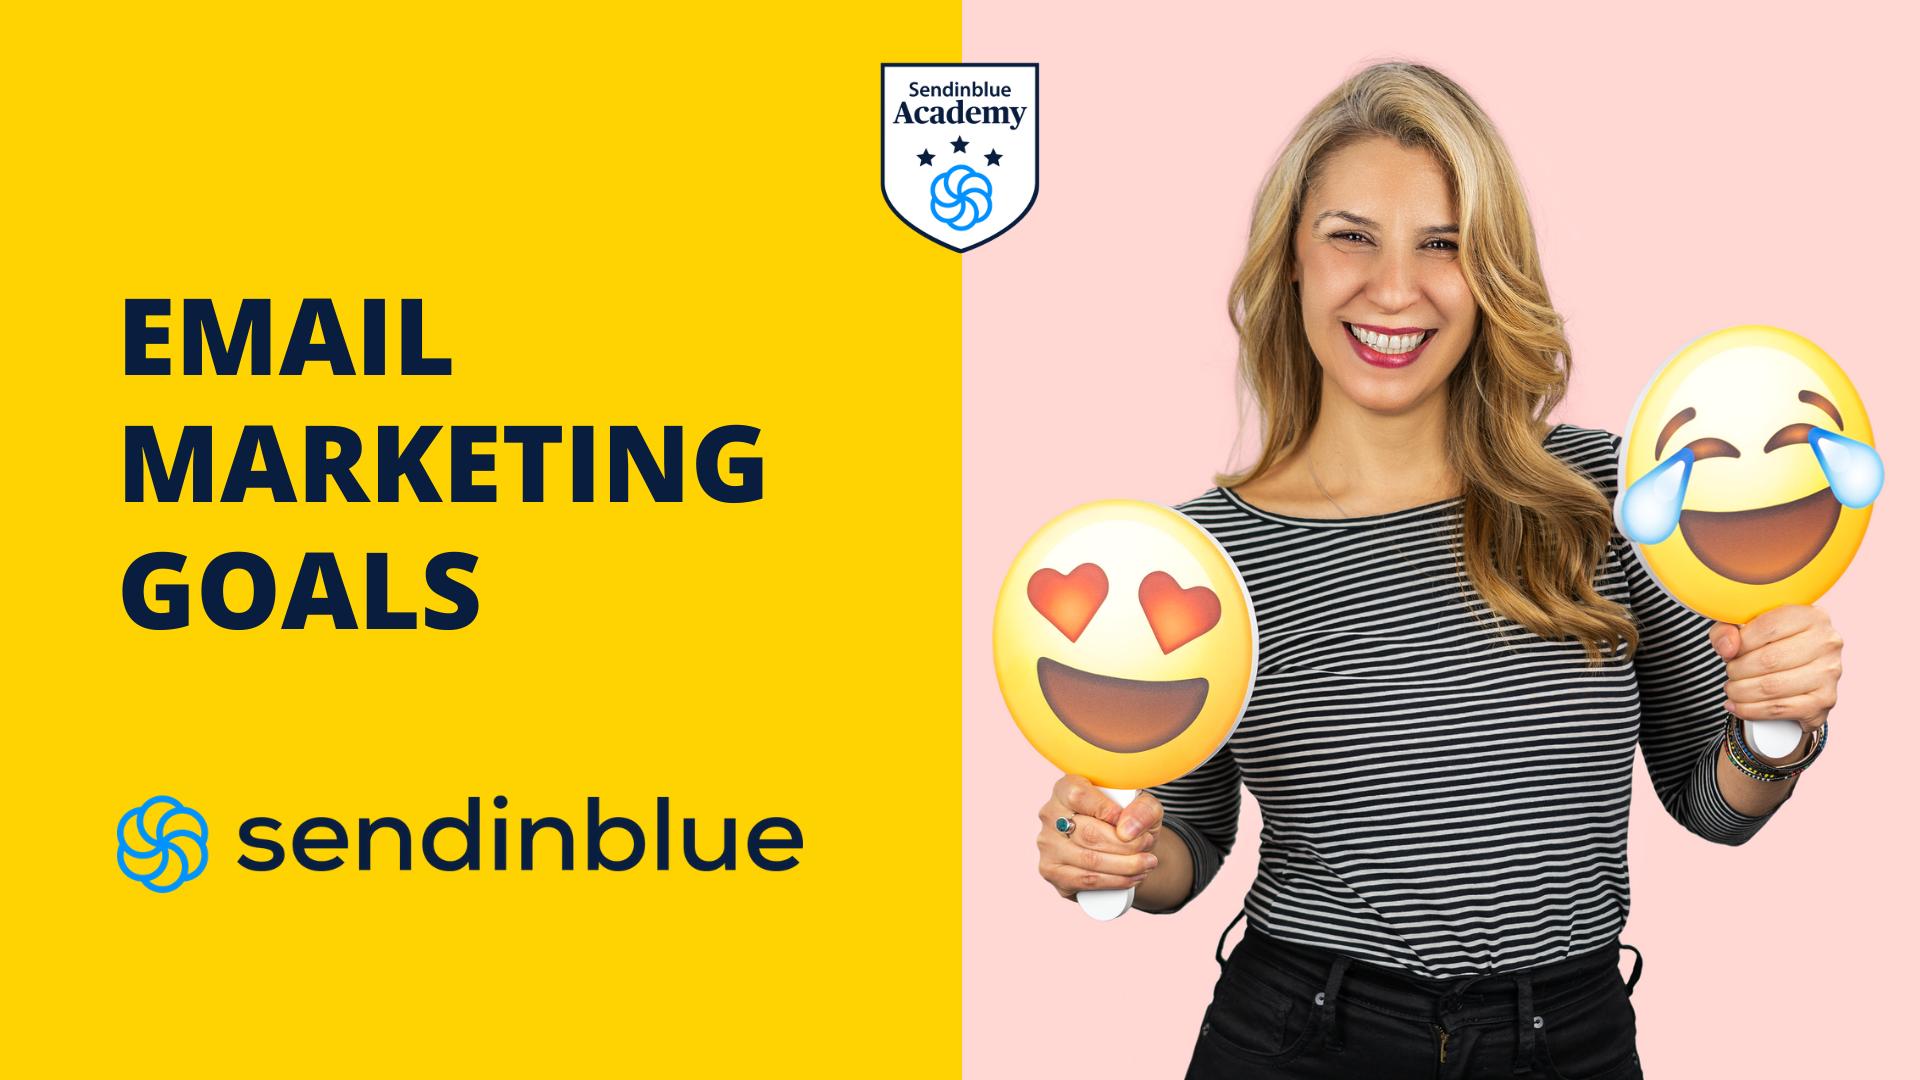 sendinblue academy graphic email marketing goals